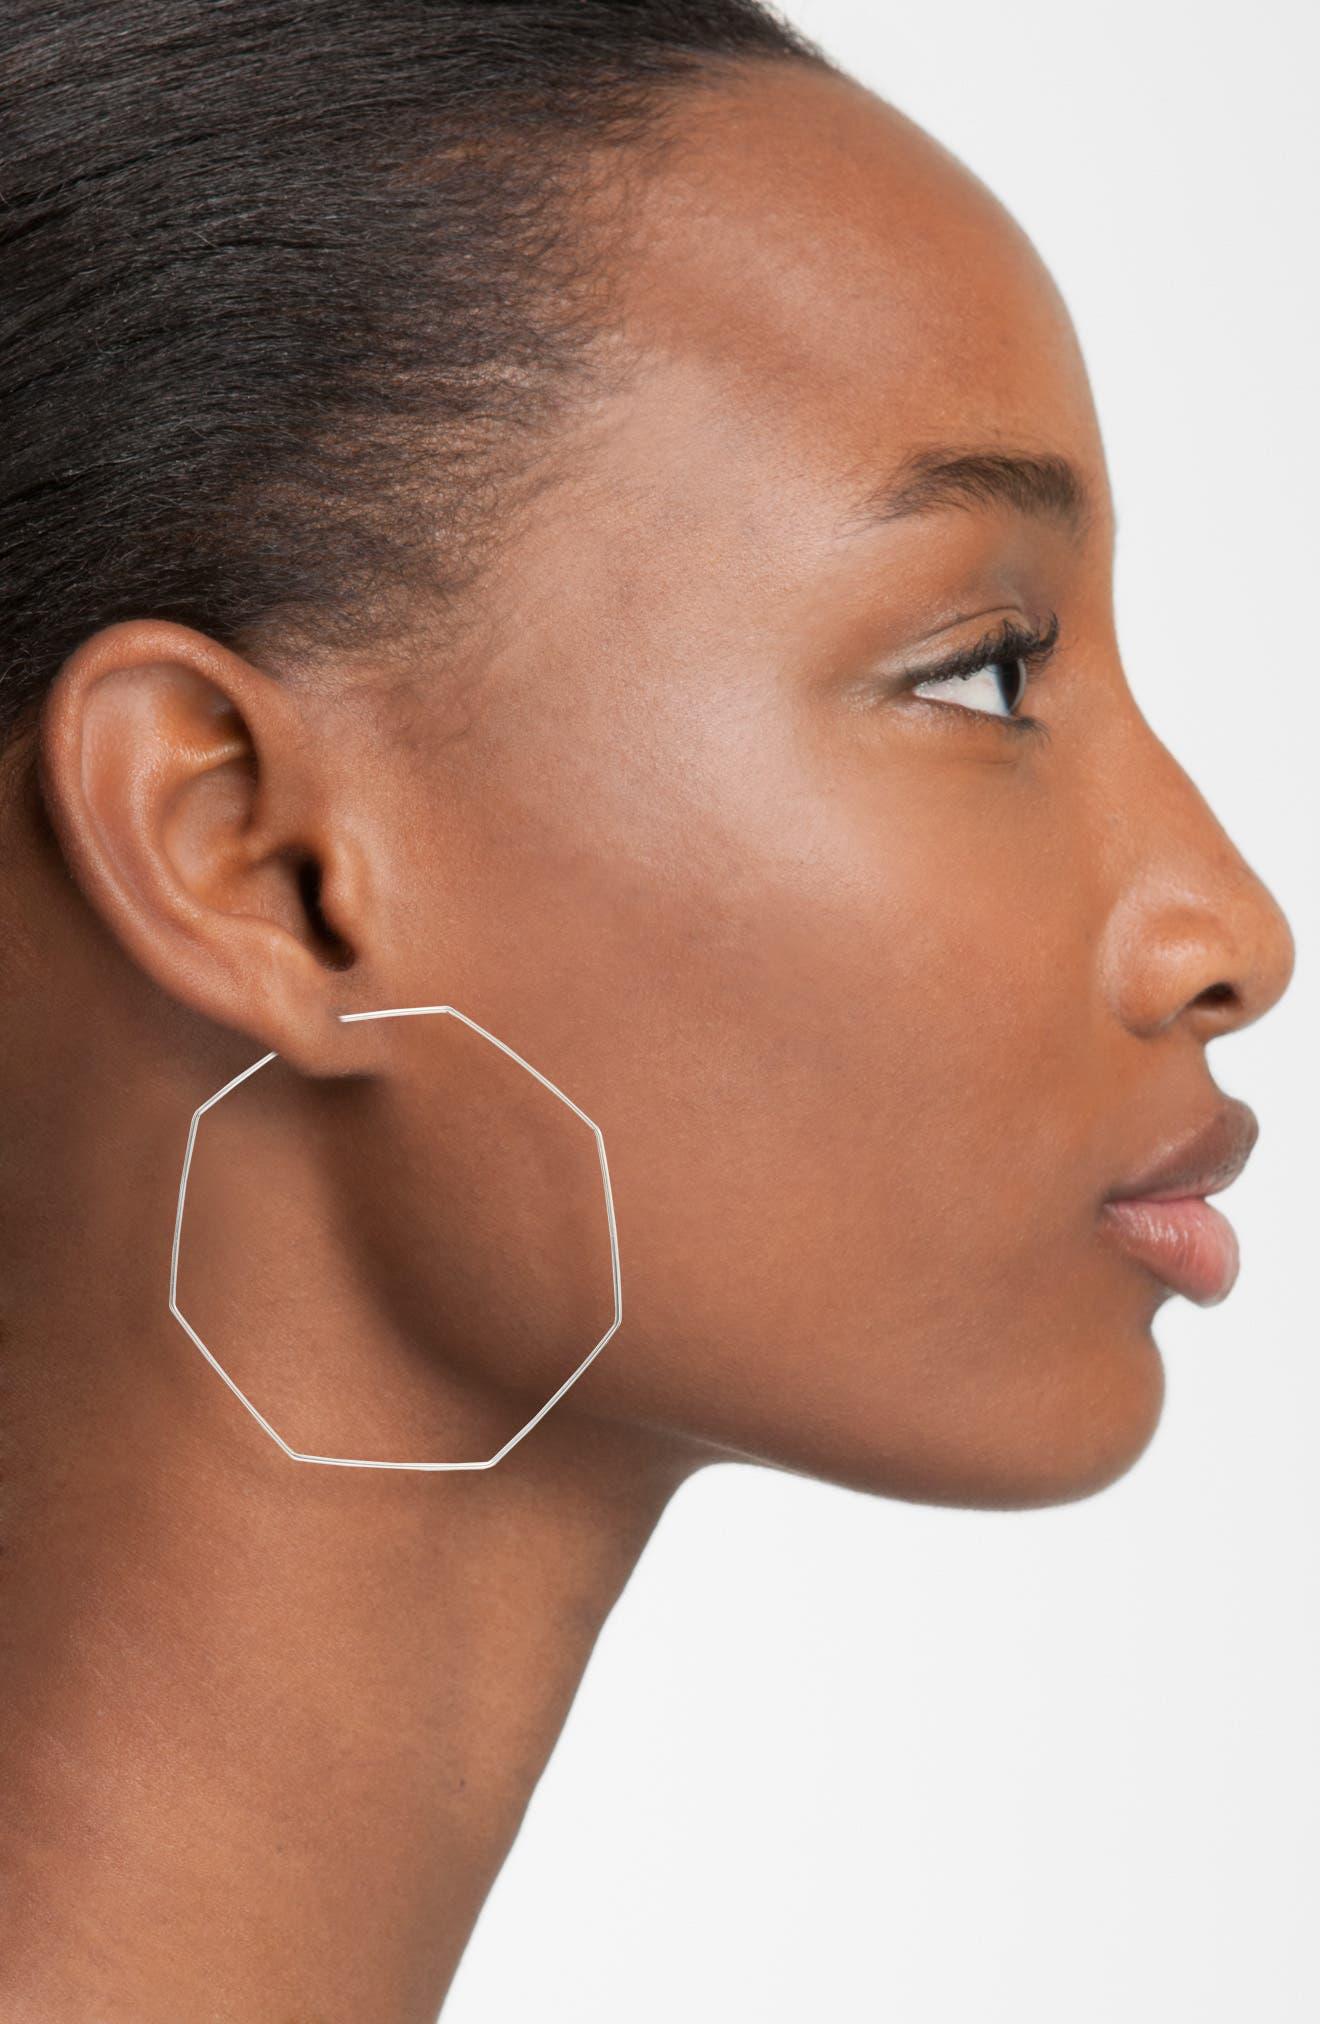 Octagon Hoop Earrings,                             Alternate thumbnail 2, color,                             SILVER